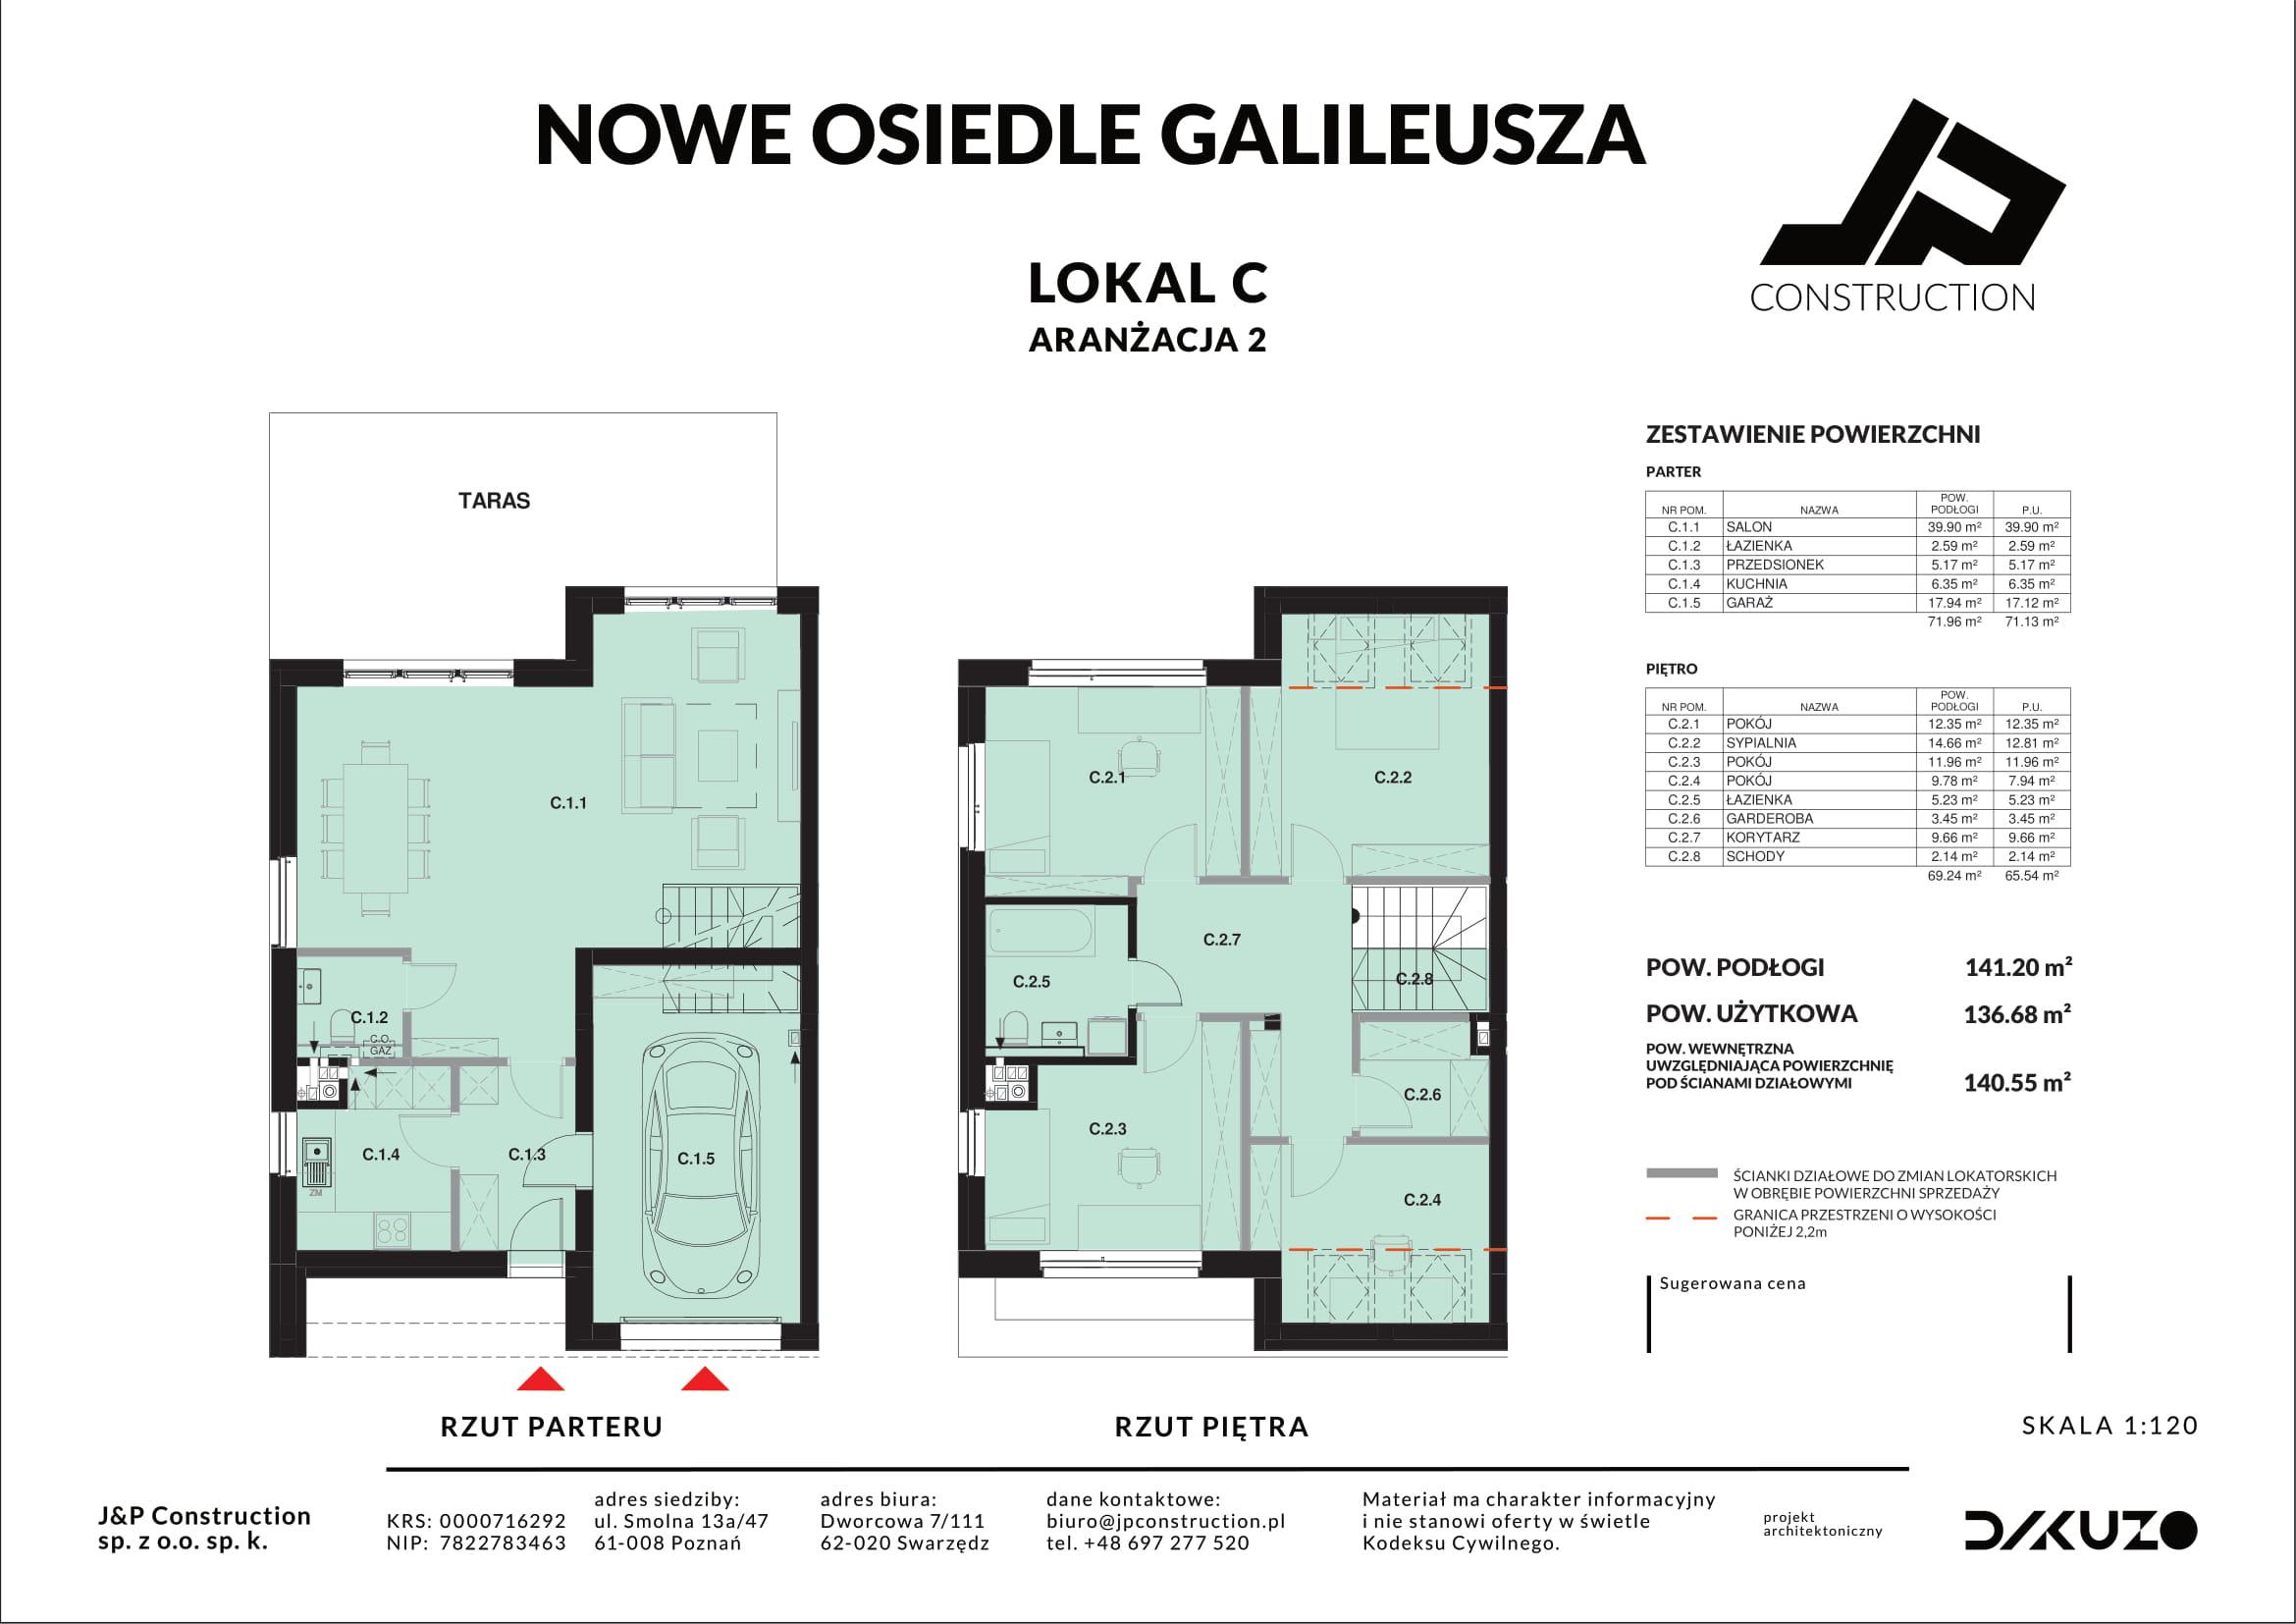 ZALASEWO-GAL-KARTA-LOKAL-C-aranzacja-2-1